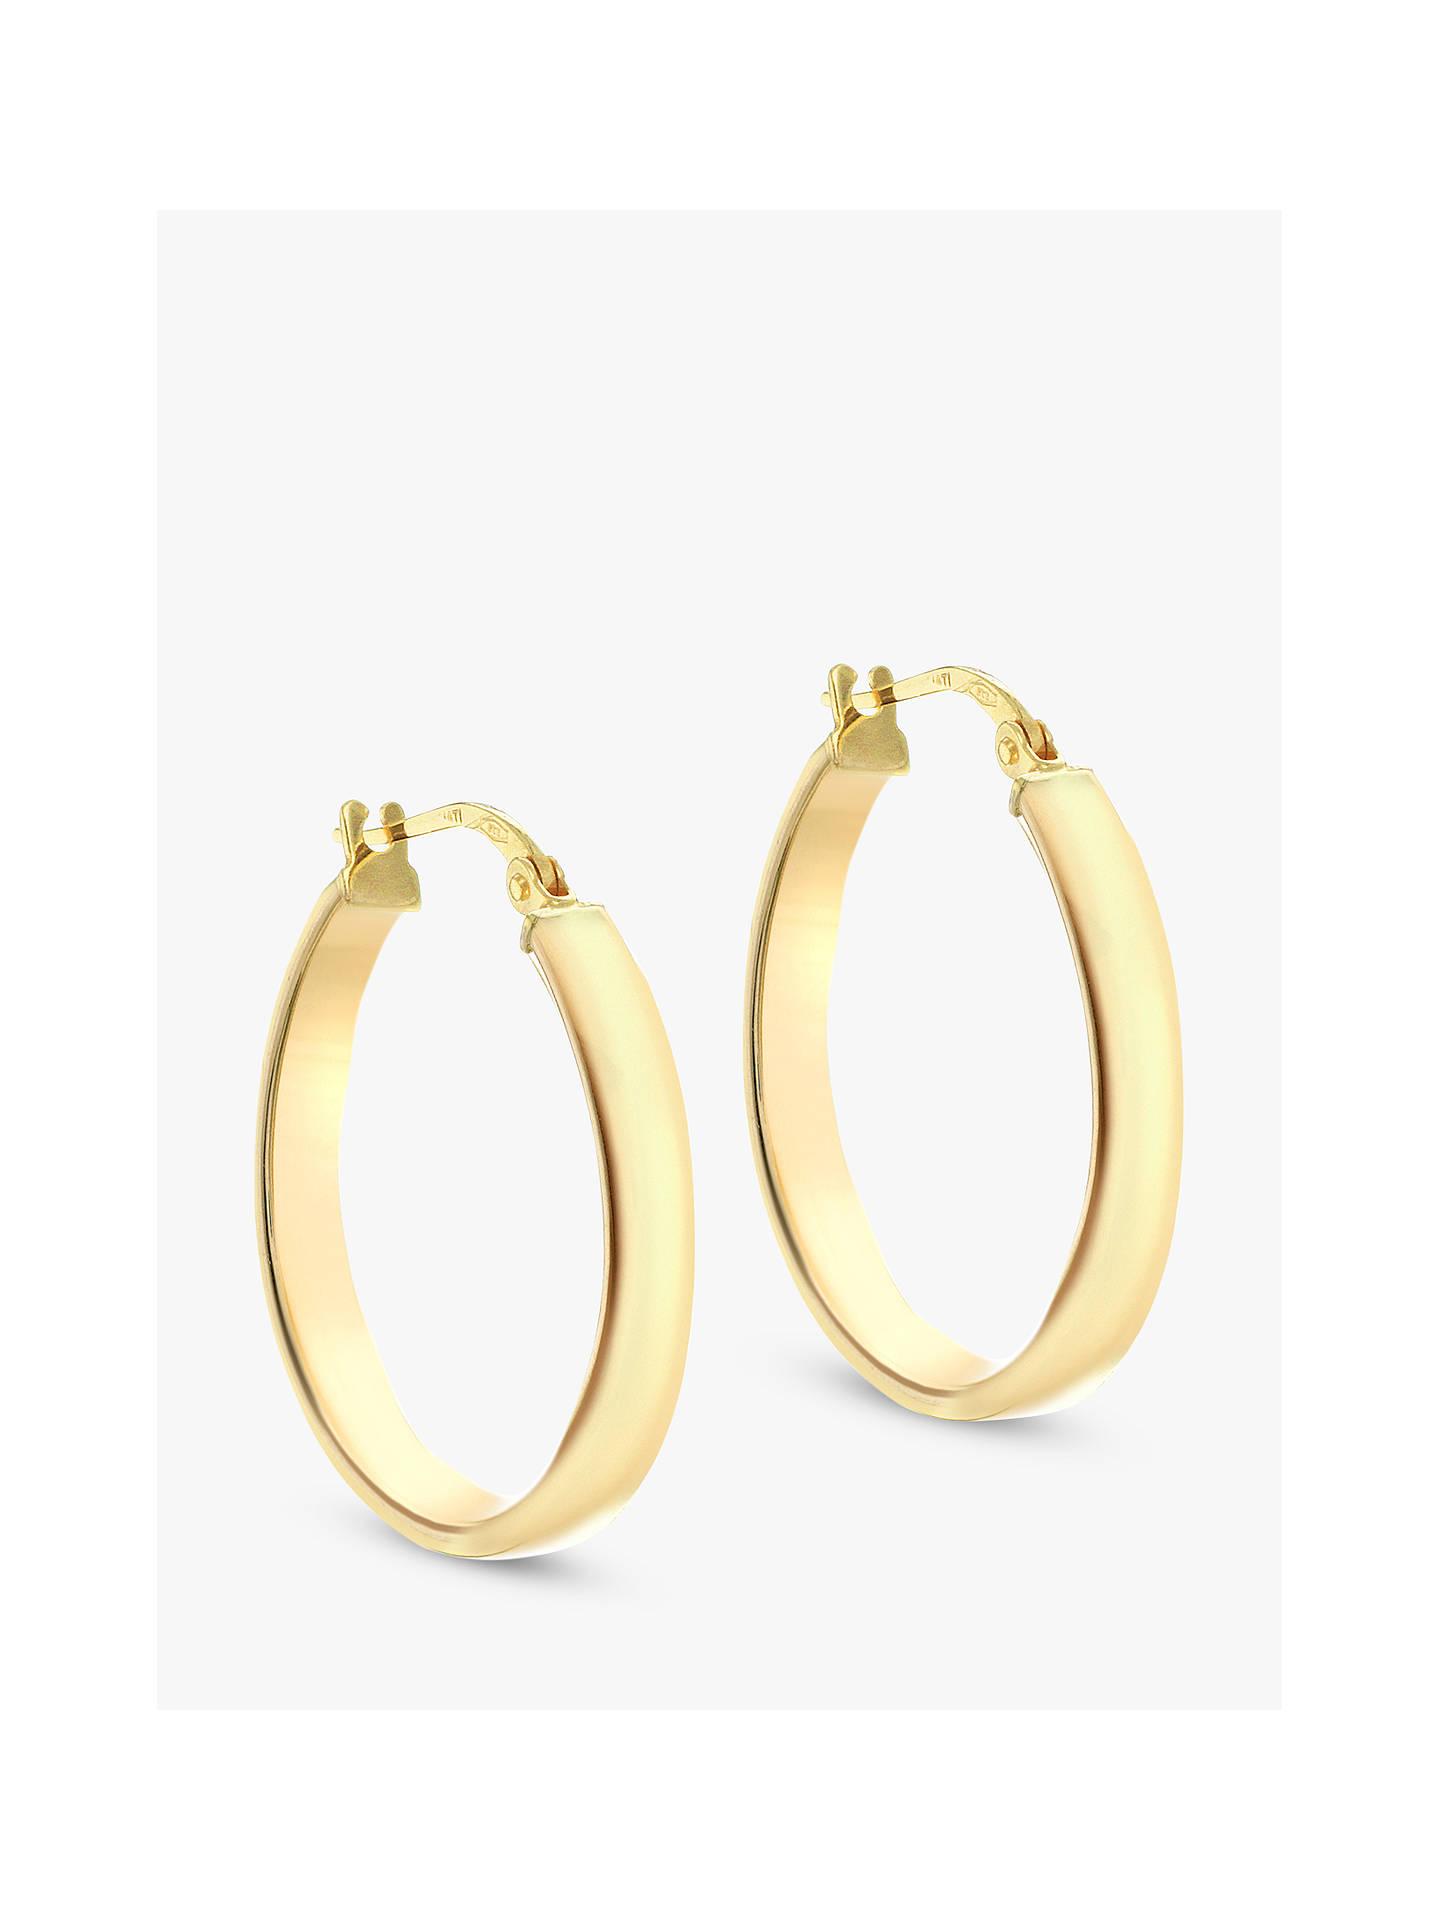 b3a6189d0e0b1 IBB 9ct Yellow Gold Creole Hoop Earrings, Gold